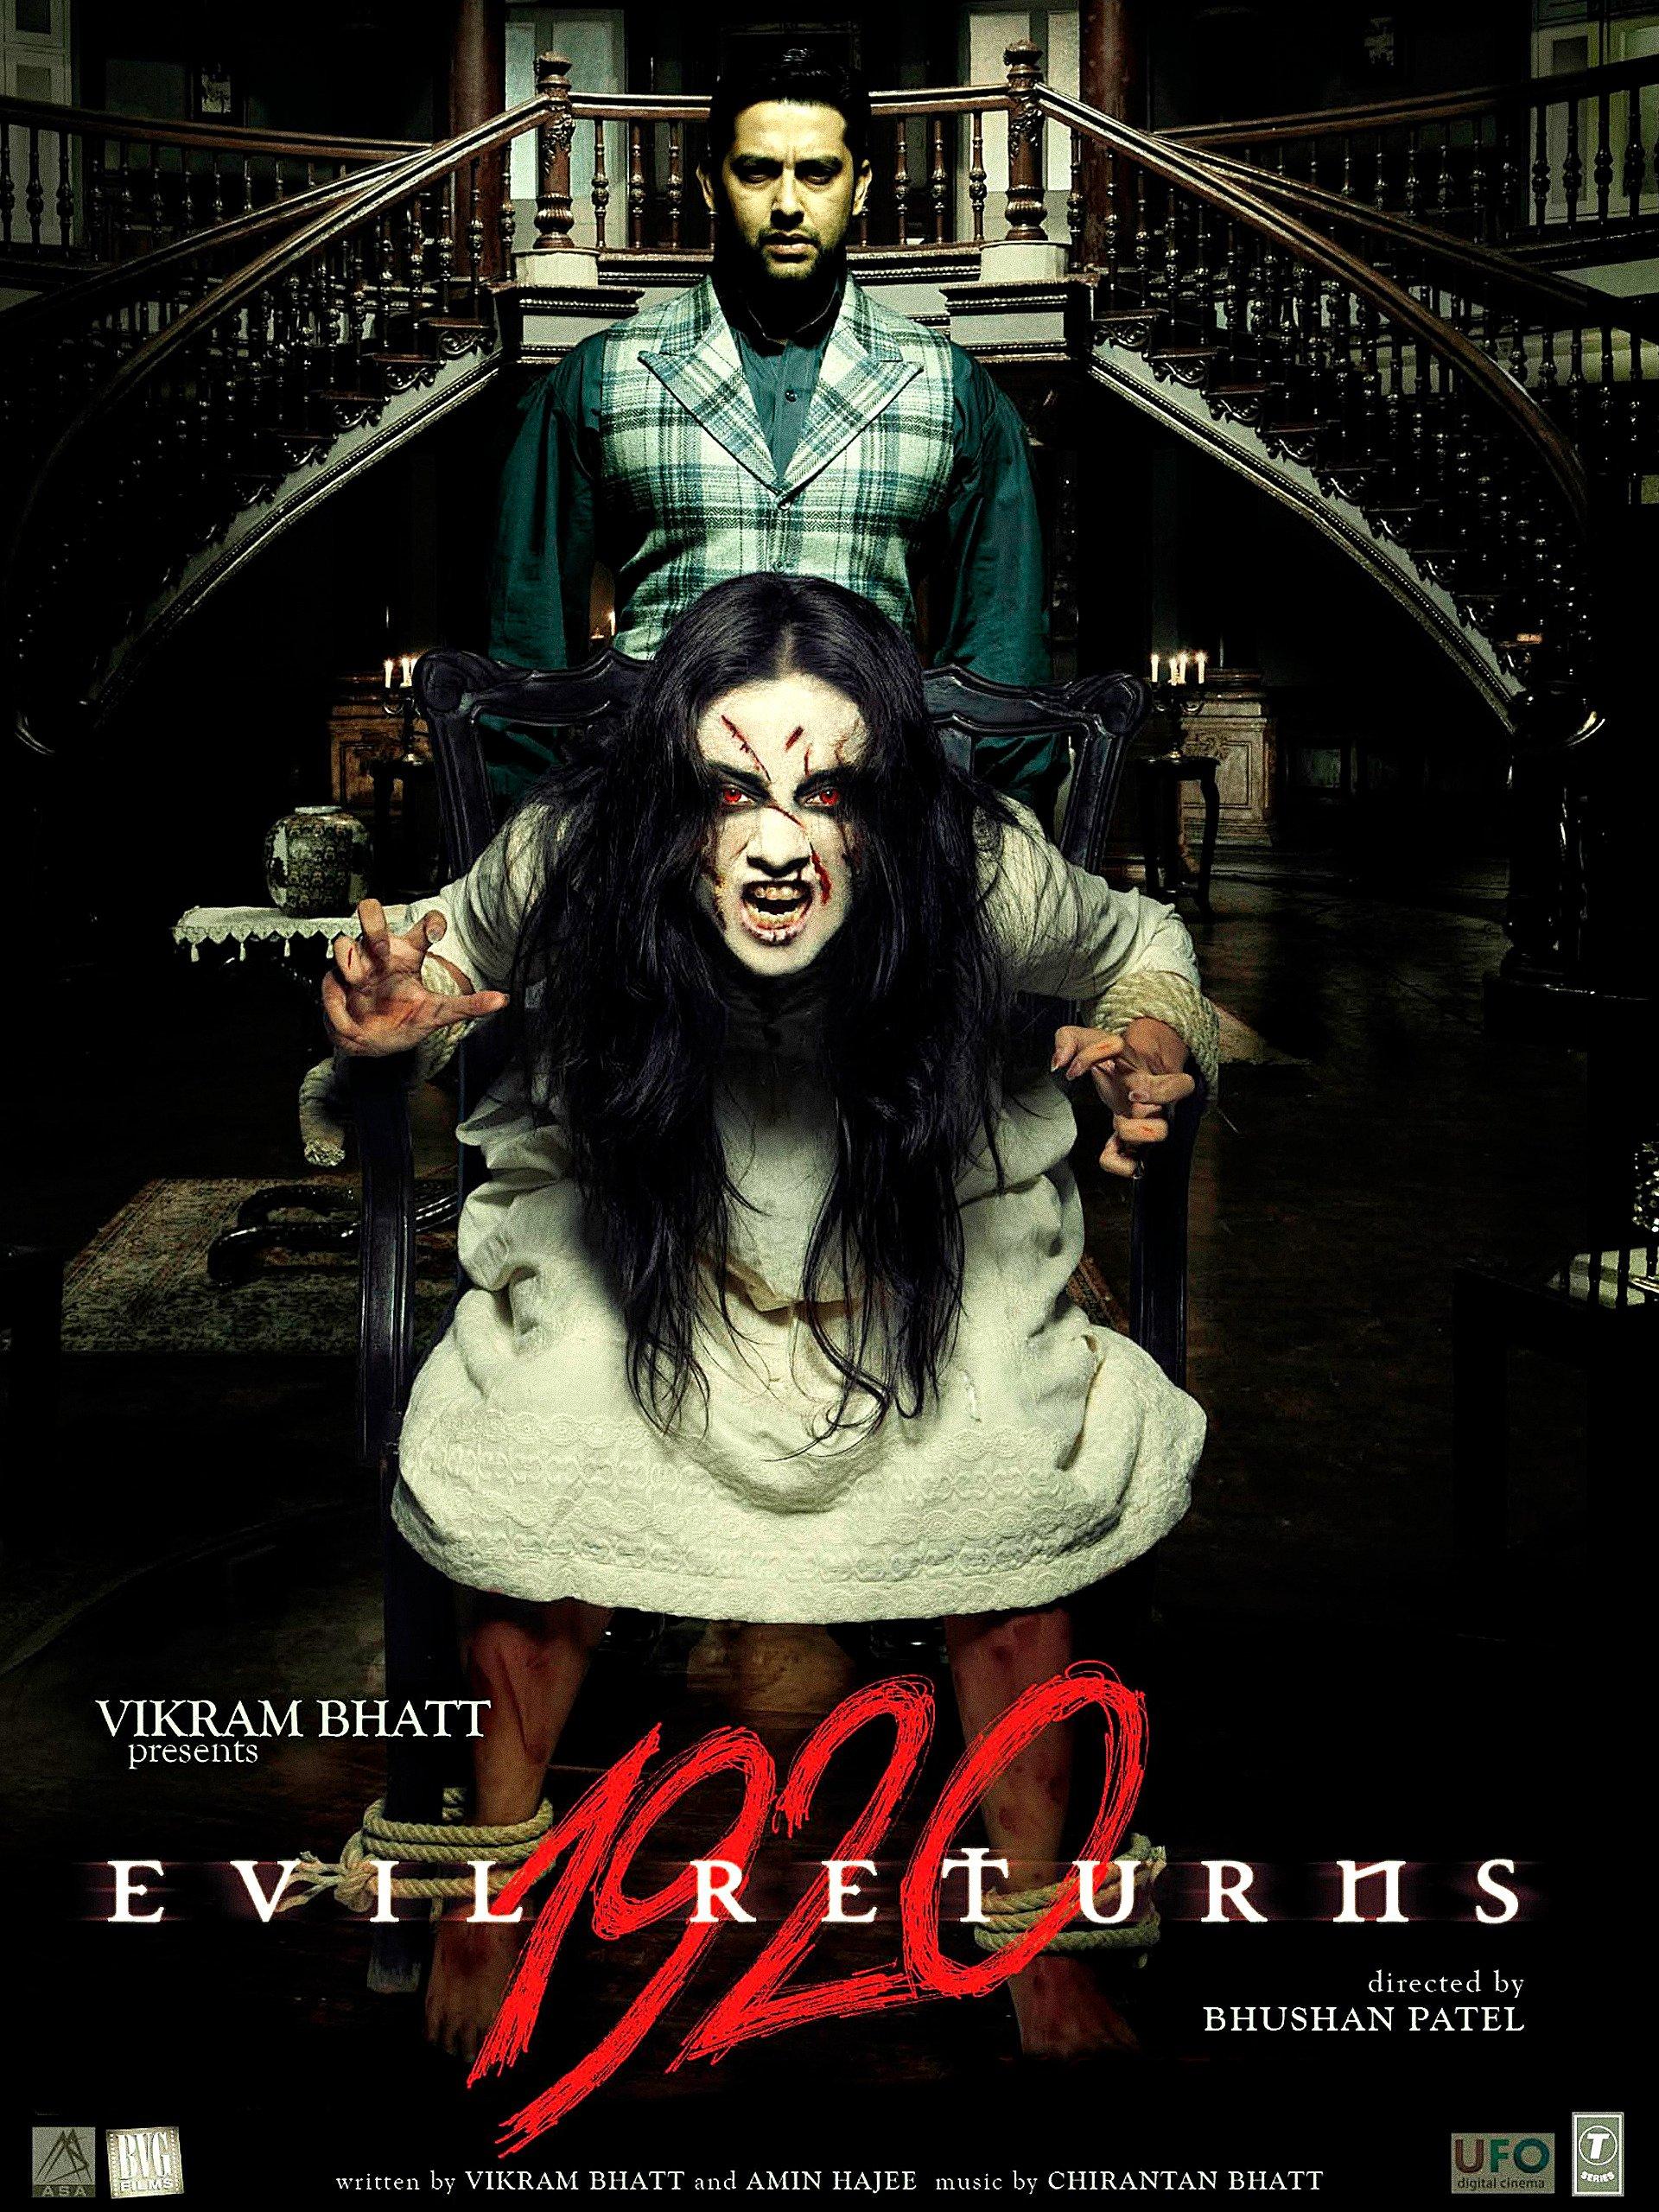 1920 evil returns full movie hd watch online free